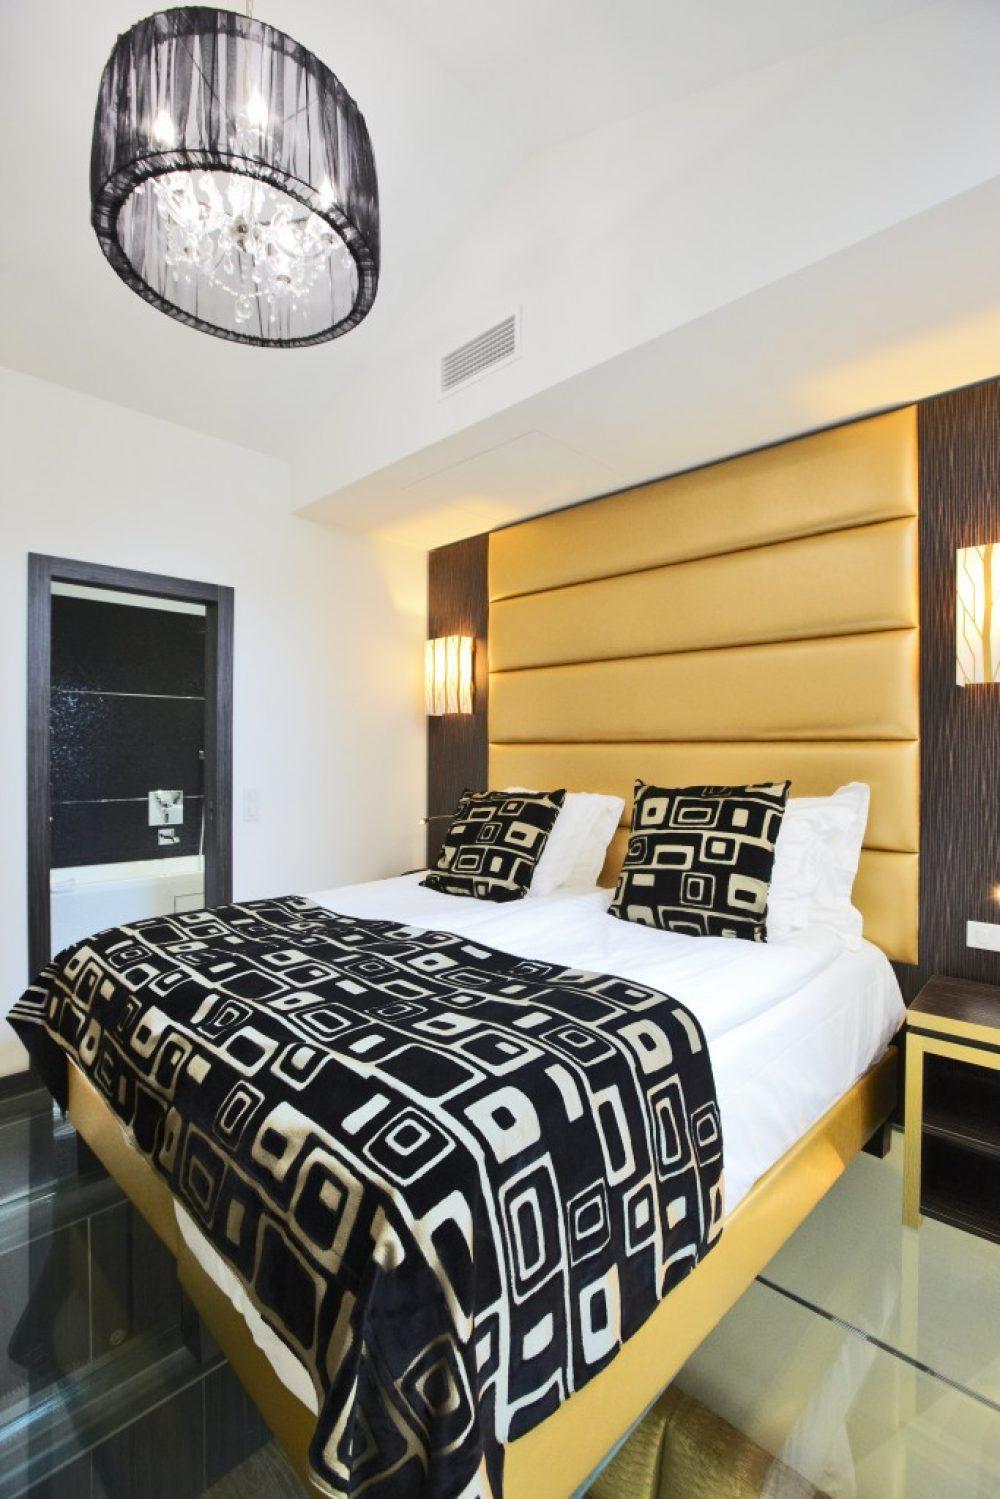 Brico Depot toulon Beau Двухуровневый номер Рюкс 35 40 м² Hotel Cannes H´tel De